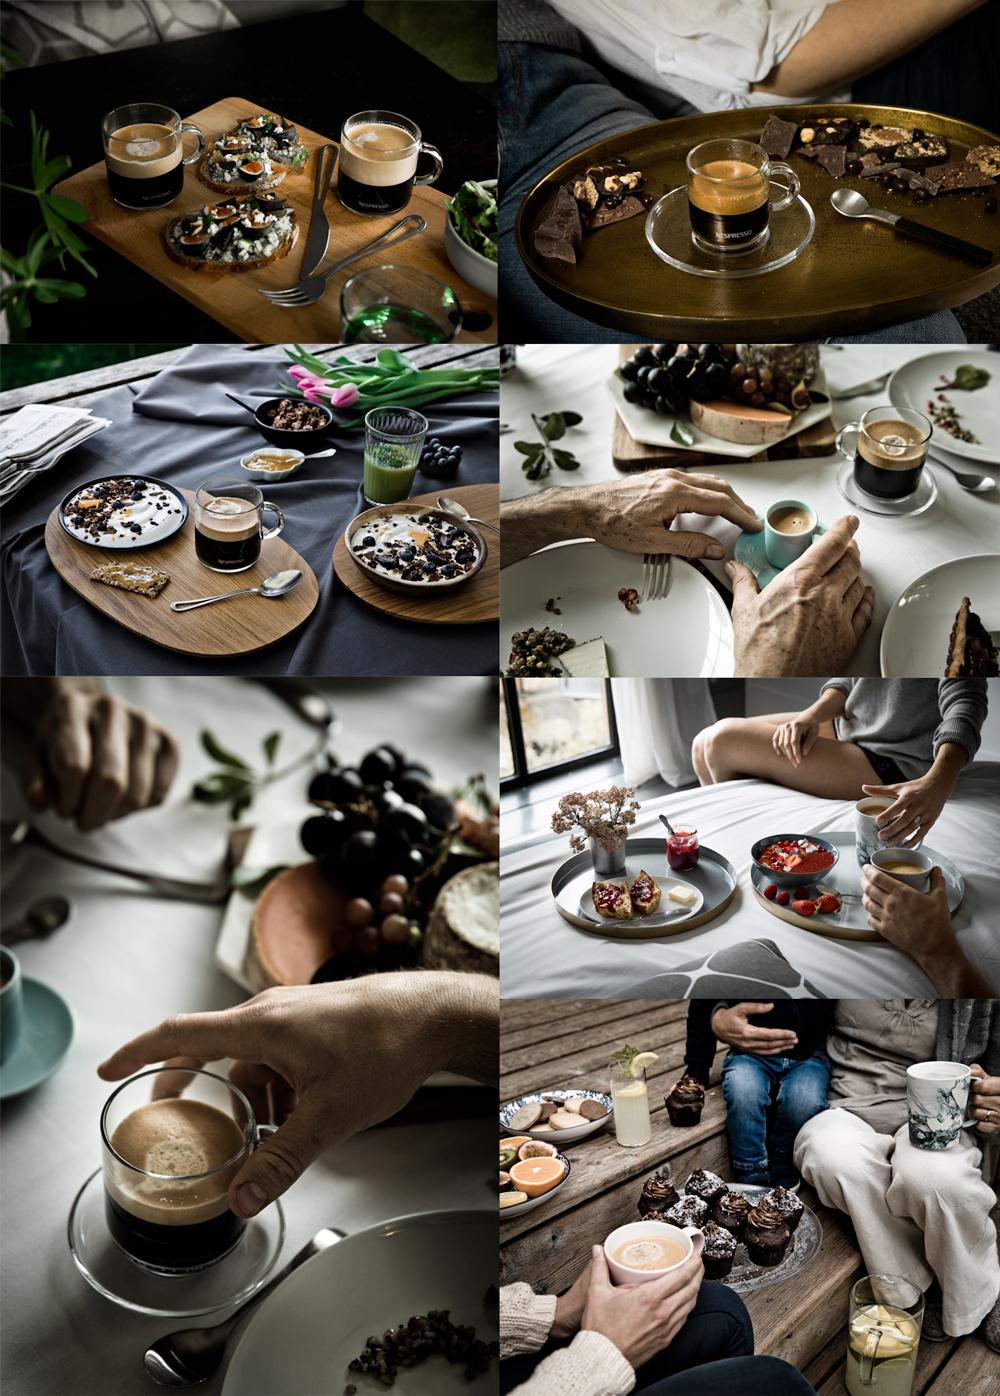 stylisme-culinaire-recette